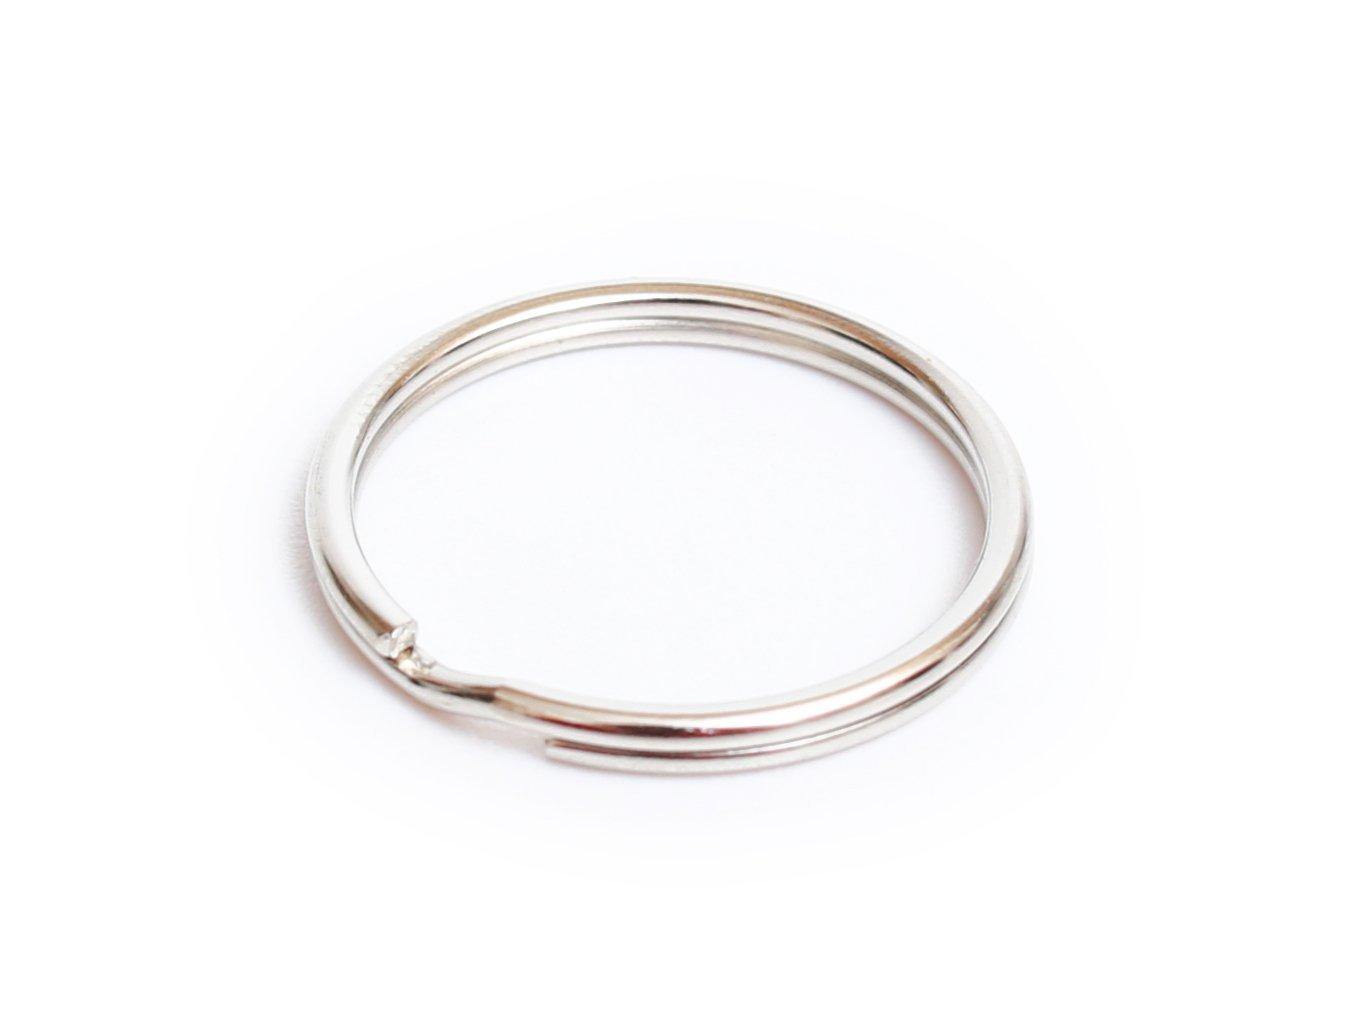 Prudance 200Pcs 1 Nickel Plated Steel Heat Treated Lead-free Round Edged Split Rings//Key Rings 25mm